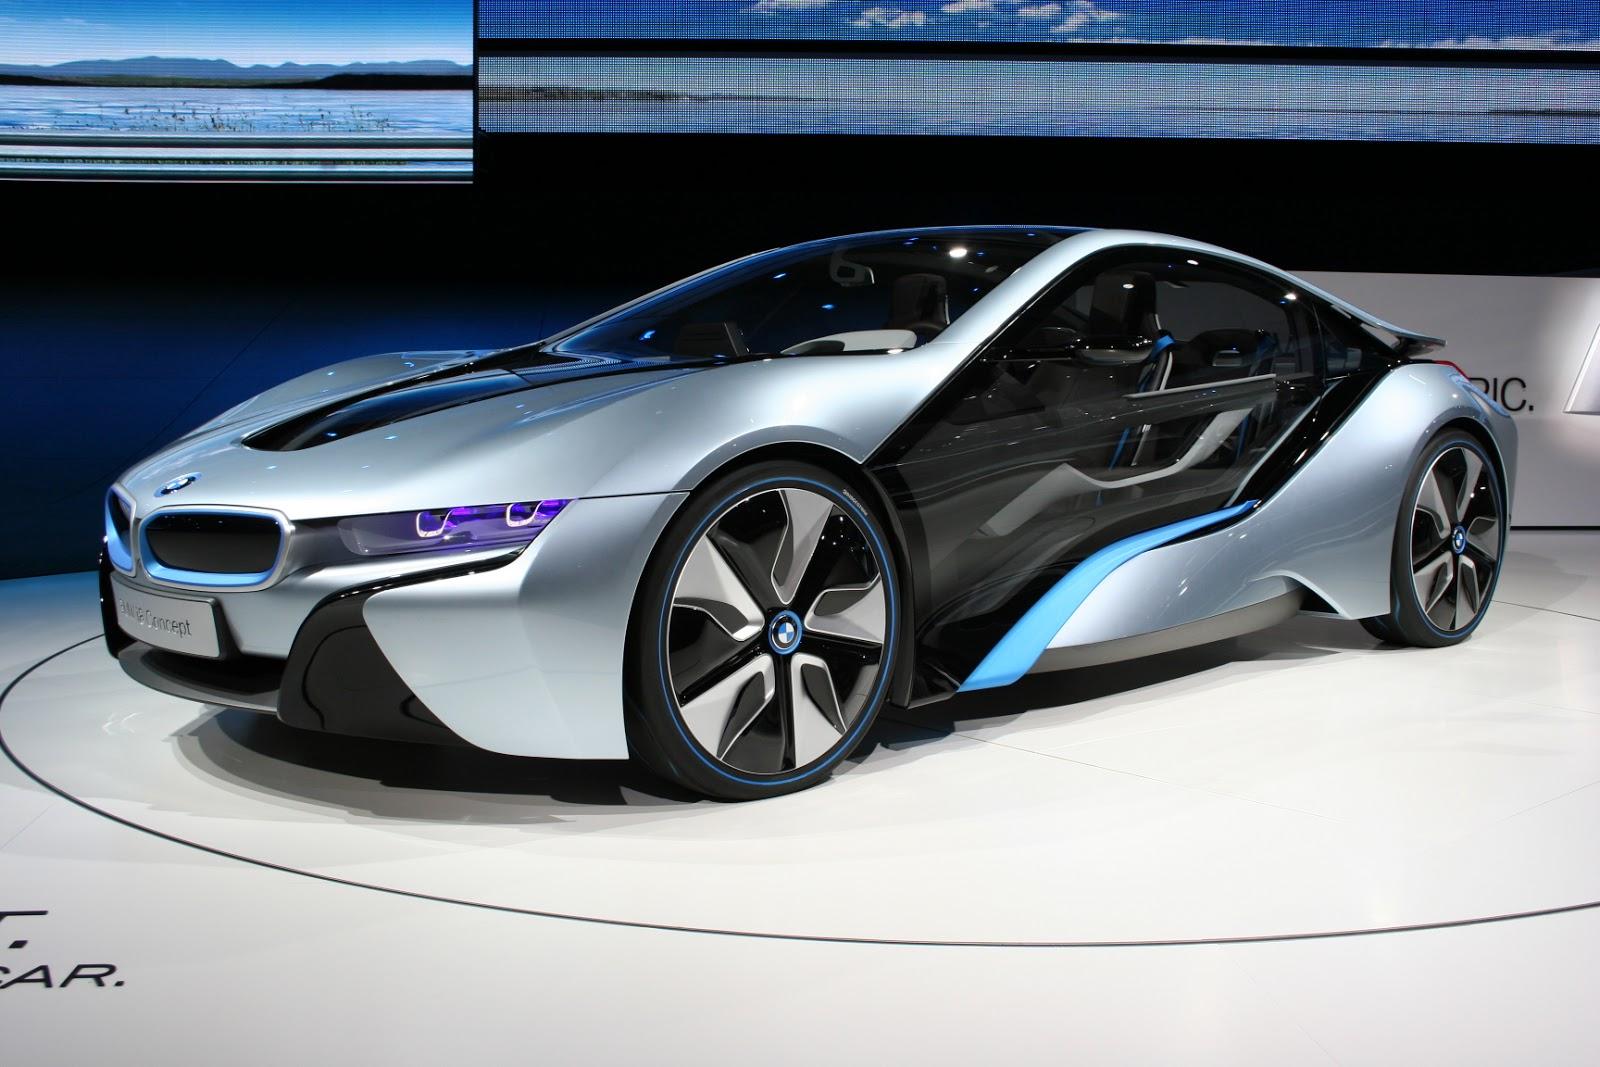 six new bmw car in auto shanghai 2013 automotive car manufacture. Black Bedroom Furniture Sets. Home Design Ideas